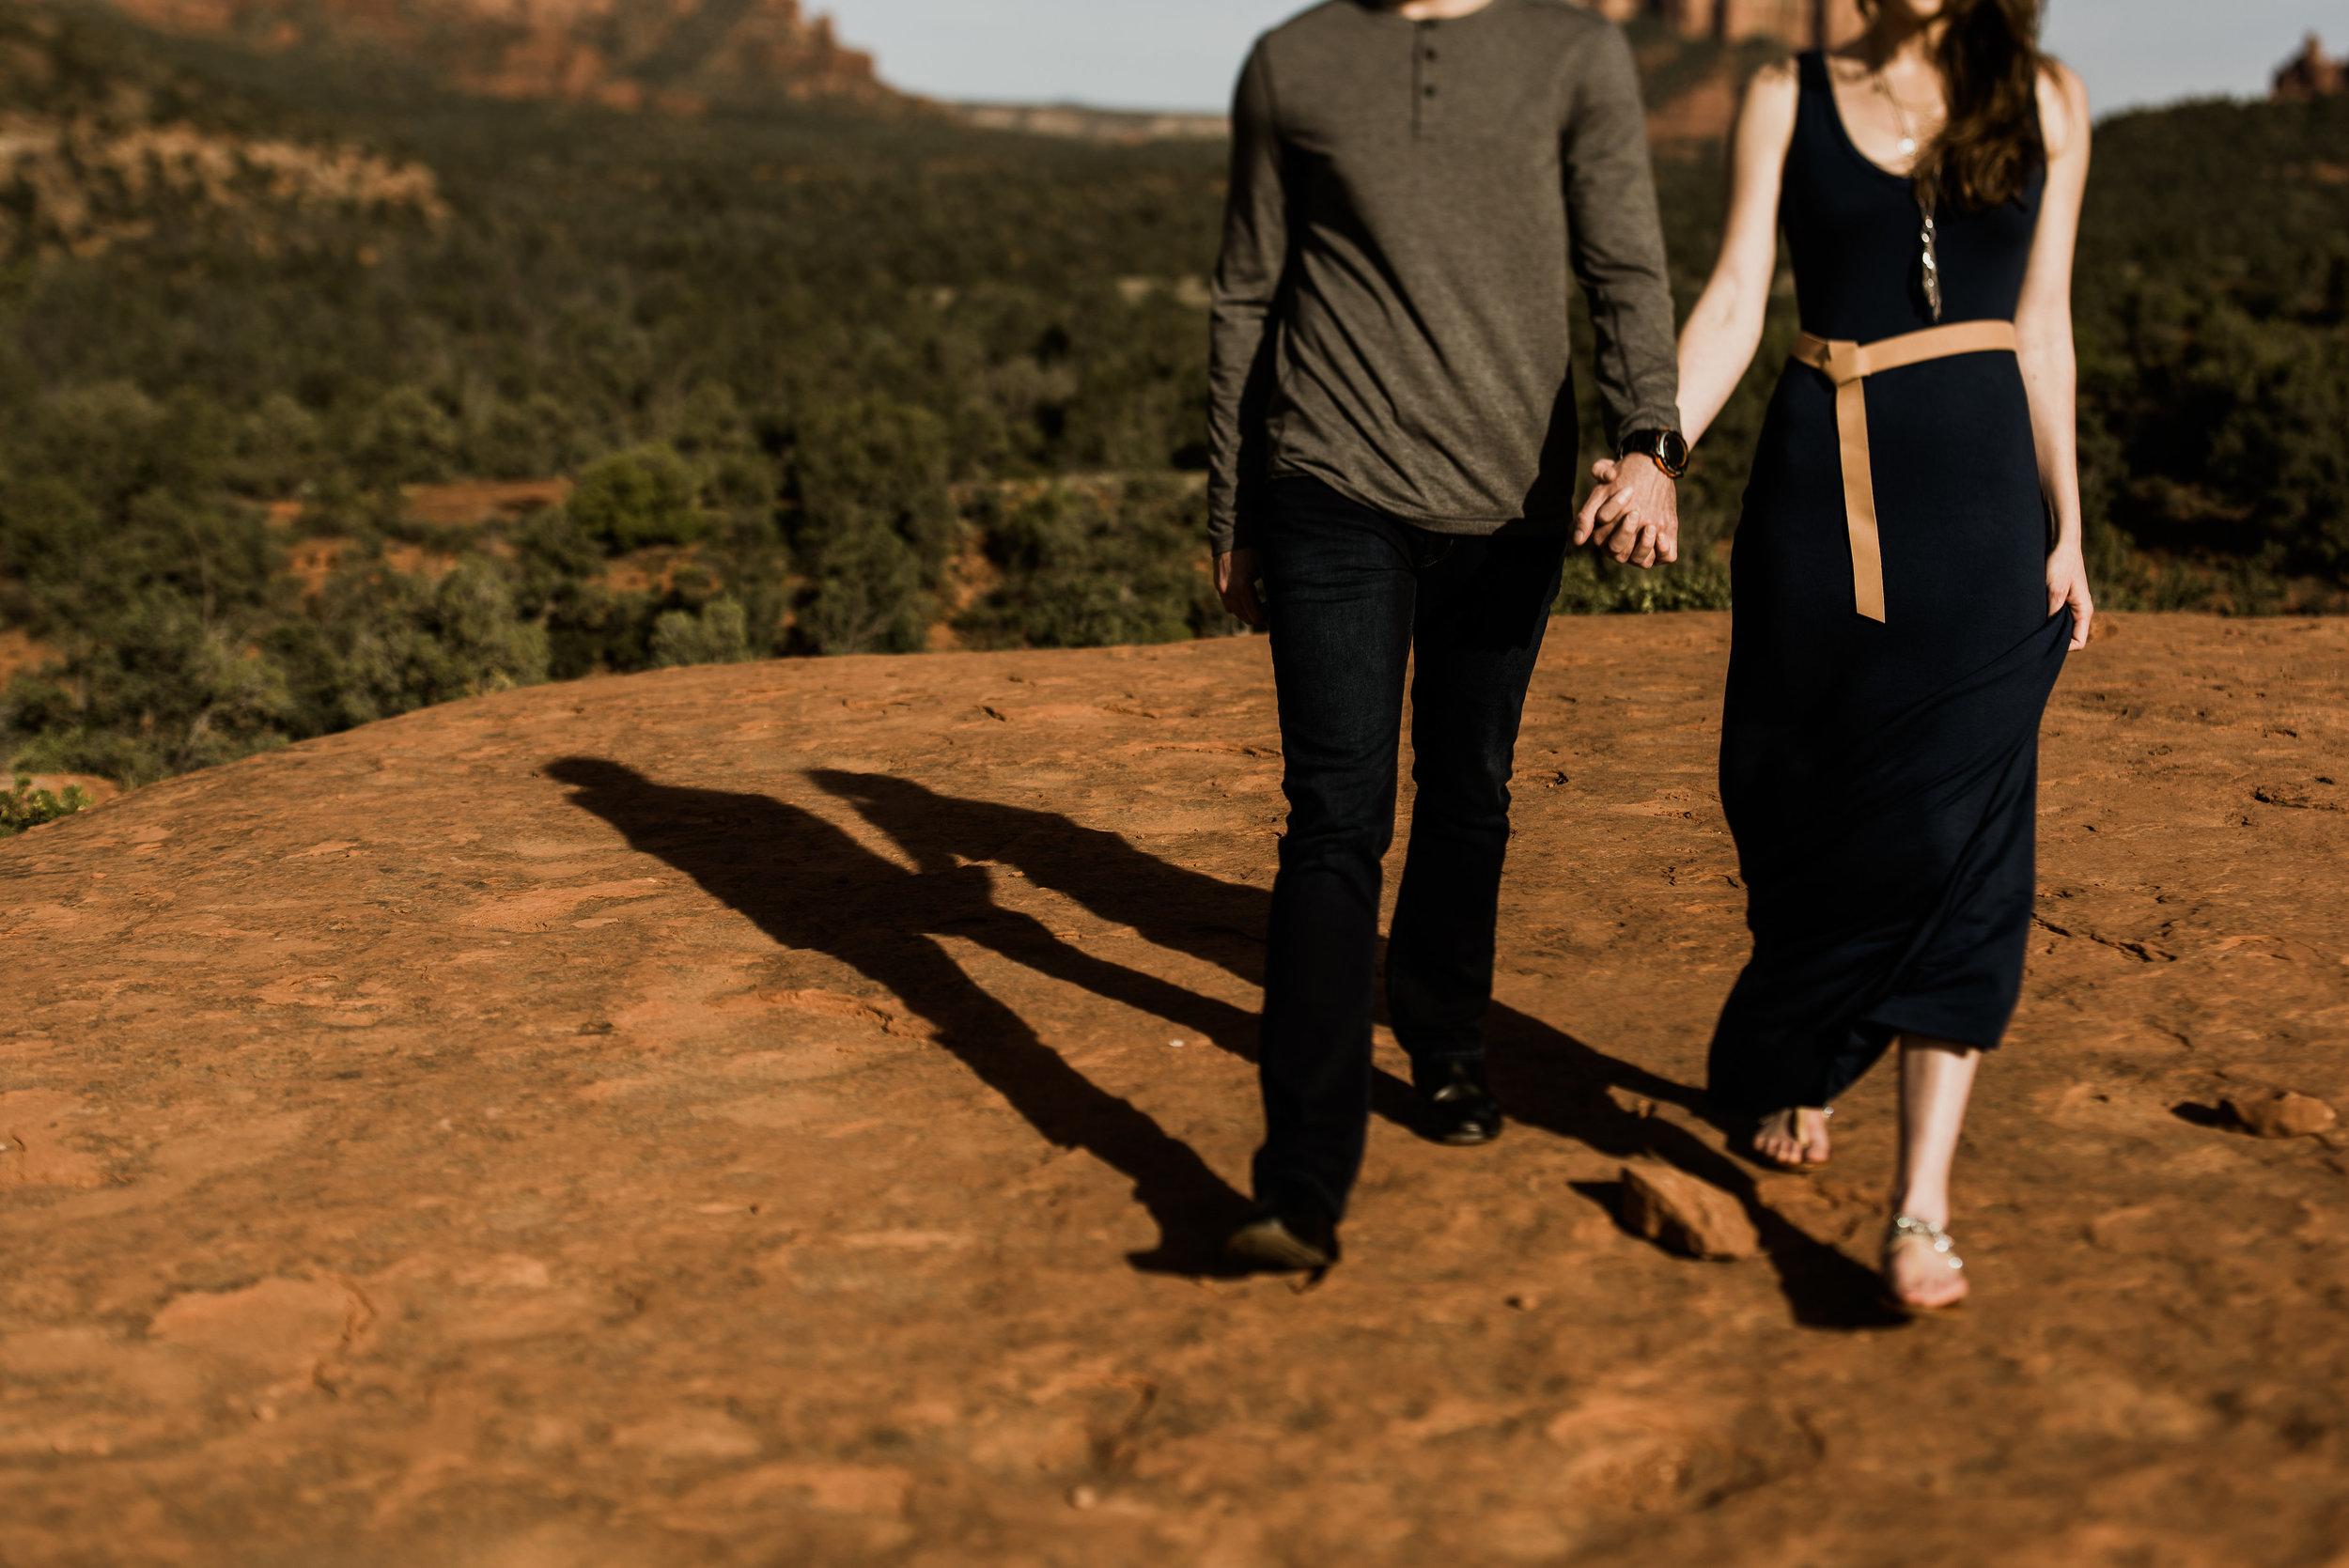 Isaiah-&-Taylor-Photography---Paul-&-Karen-Engagement,-Sedona-Arizona-020.jpg